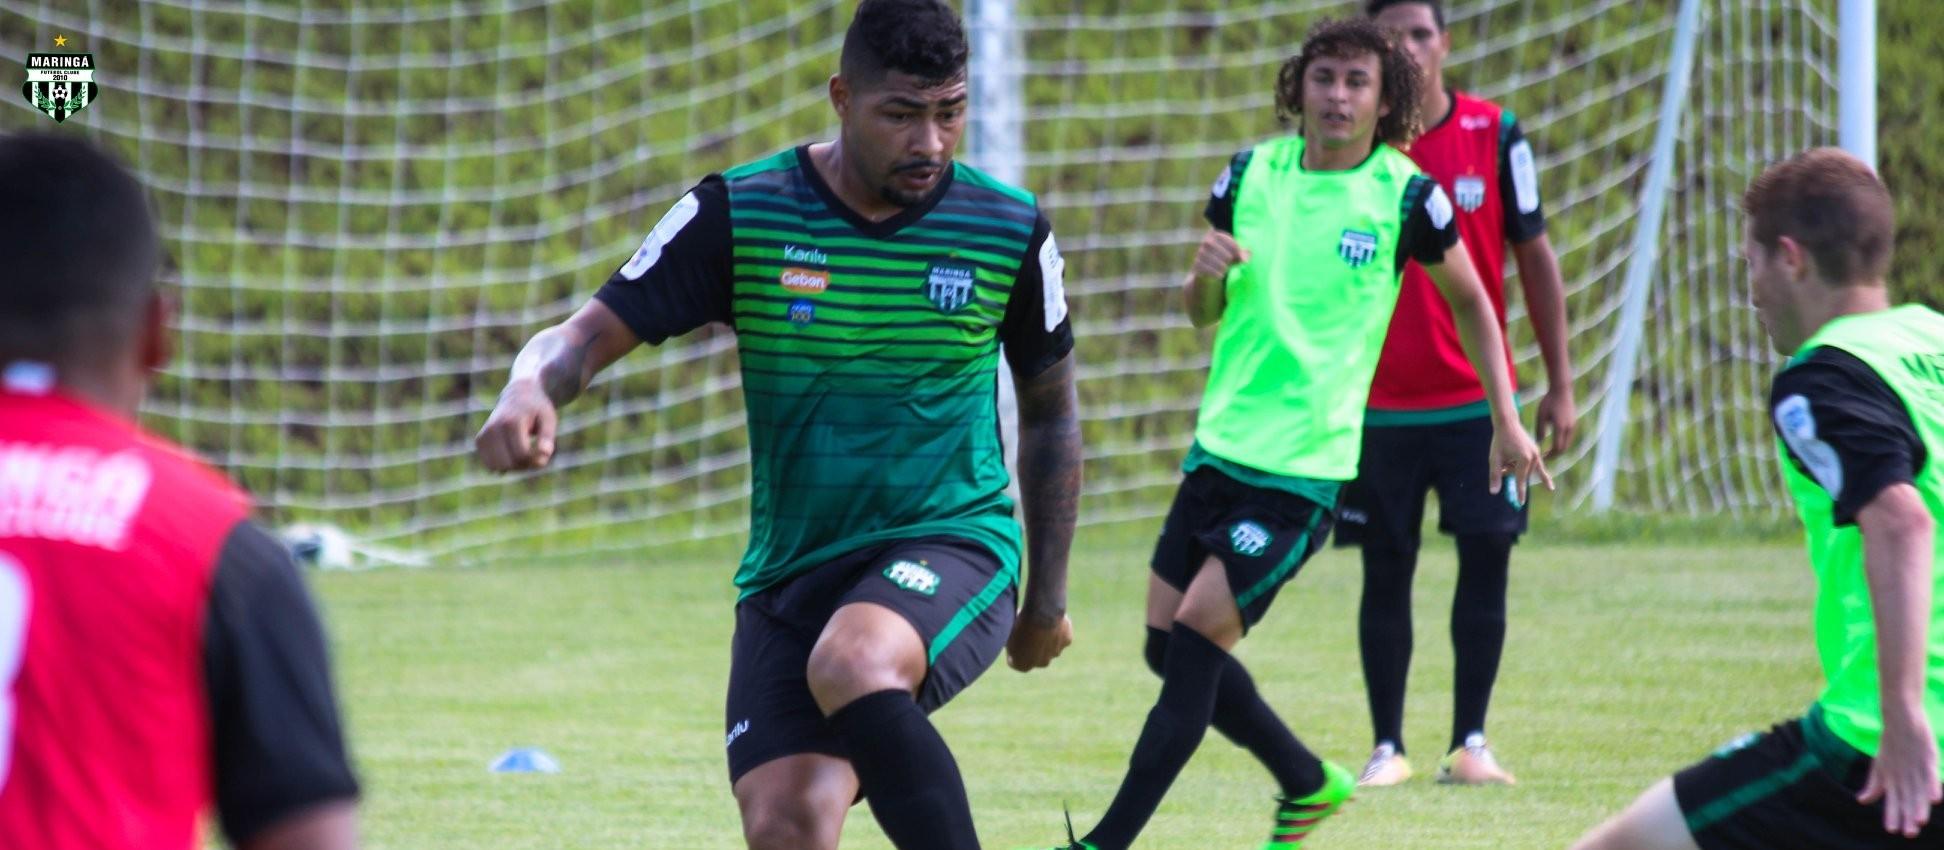 Maringá FC enfrenta o Prudentópolis fora de casa